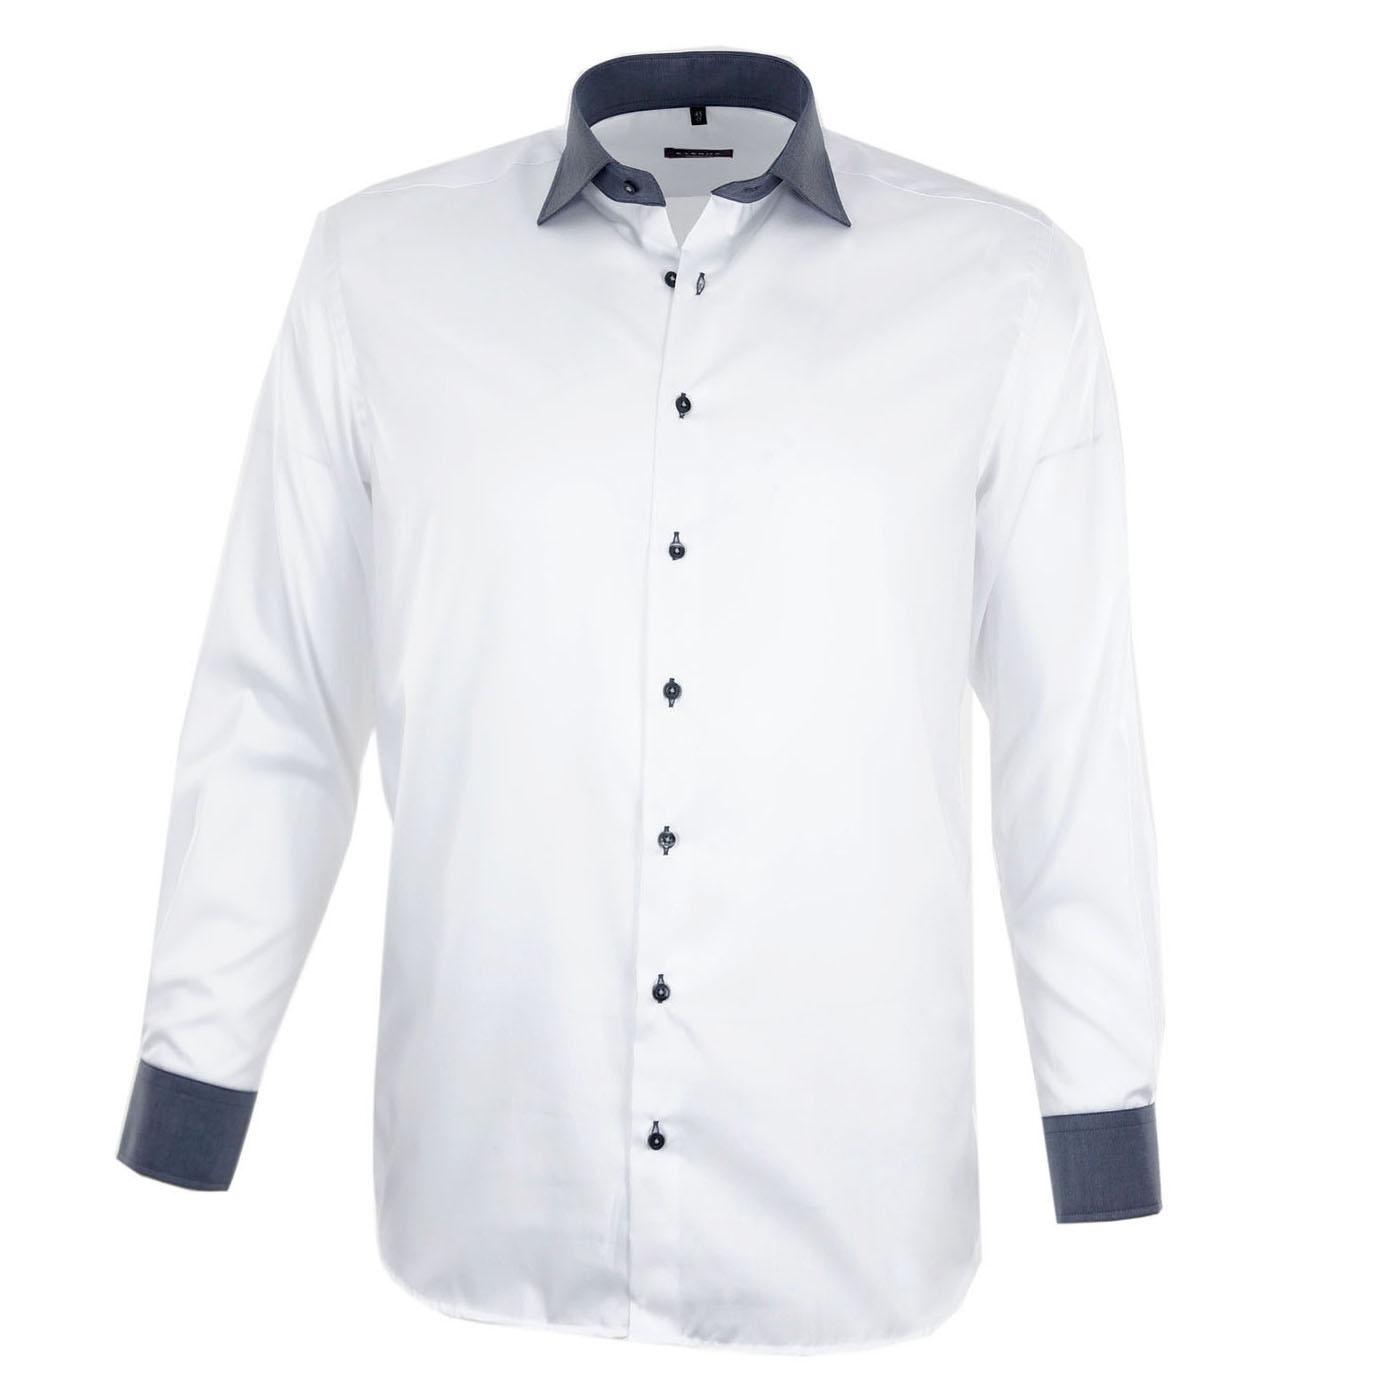 slim fit hemden herren merish herren hemd 6 modelle s xxl. Black Bedroom Furniture Sets. Home Design Ideas